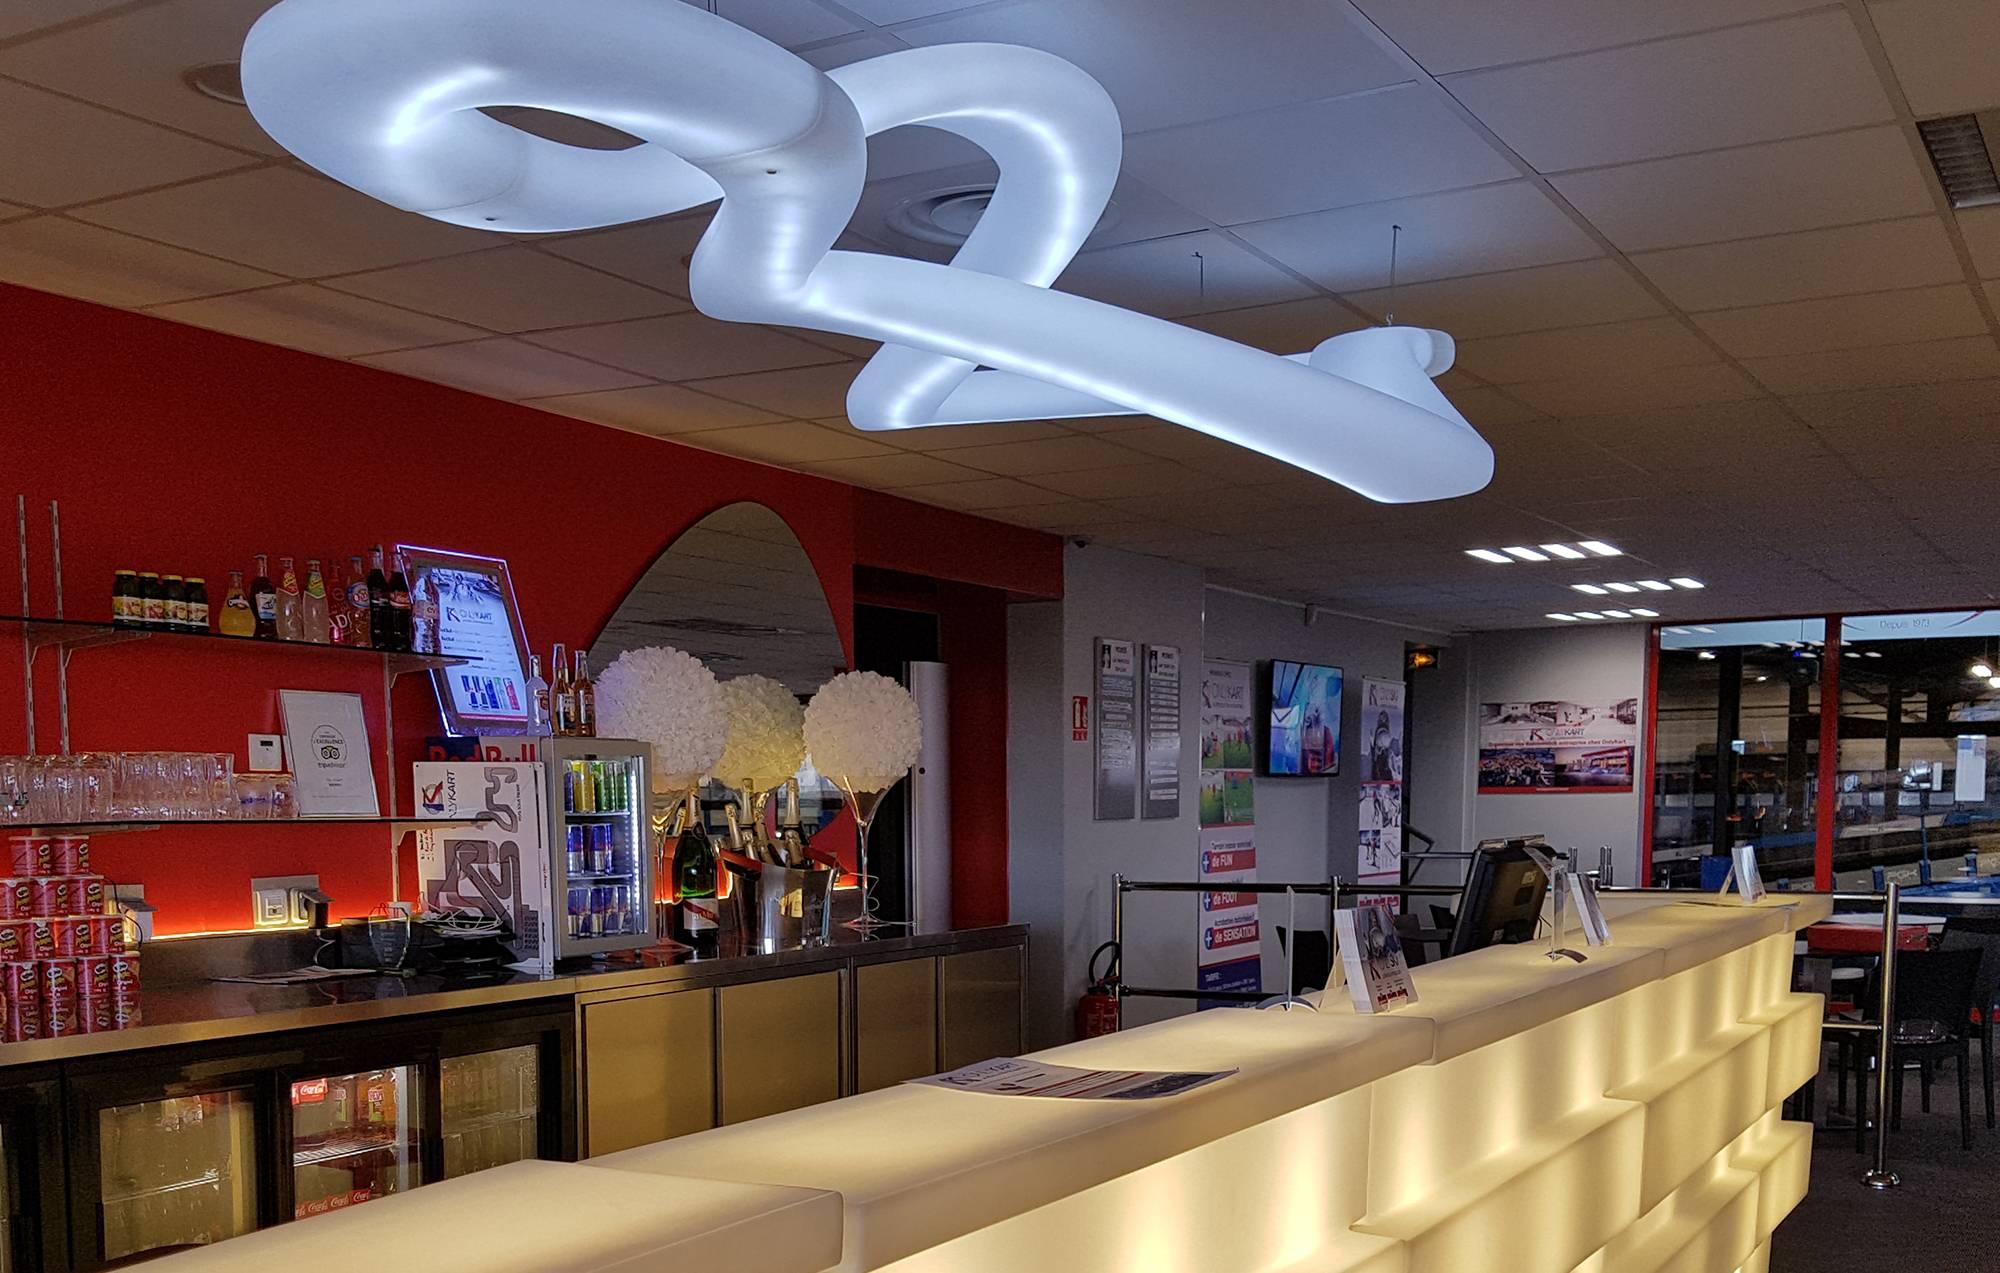 espace bar et restauration karting lyon